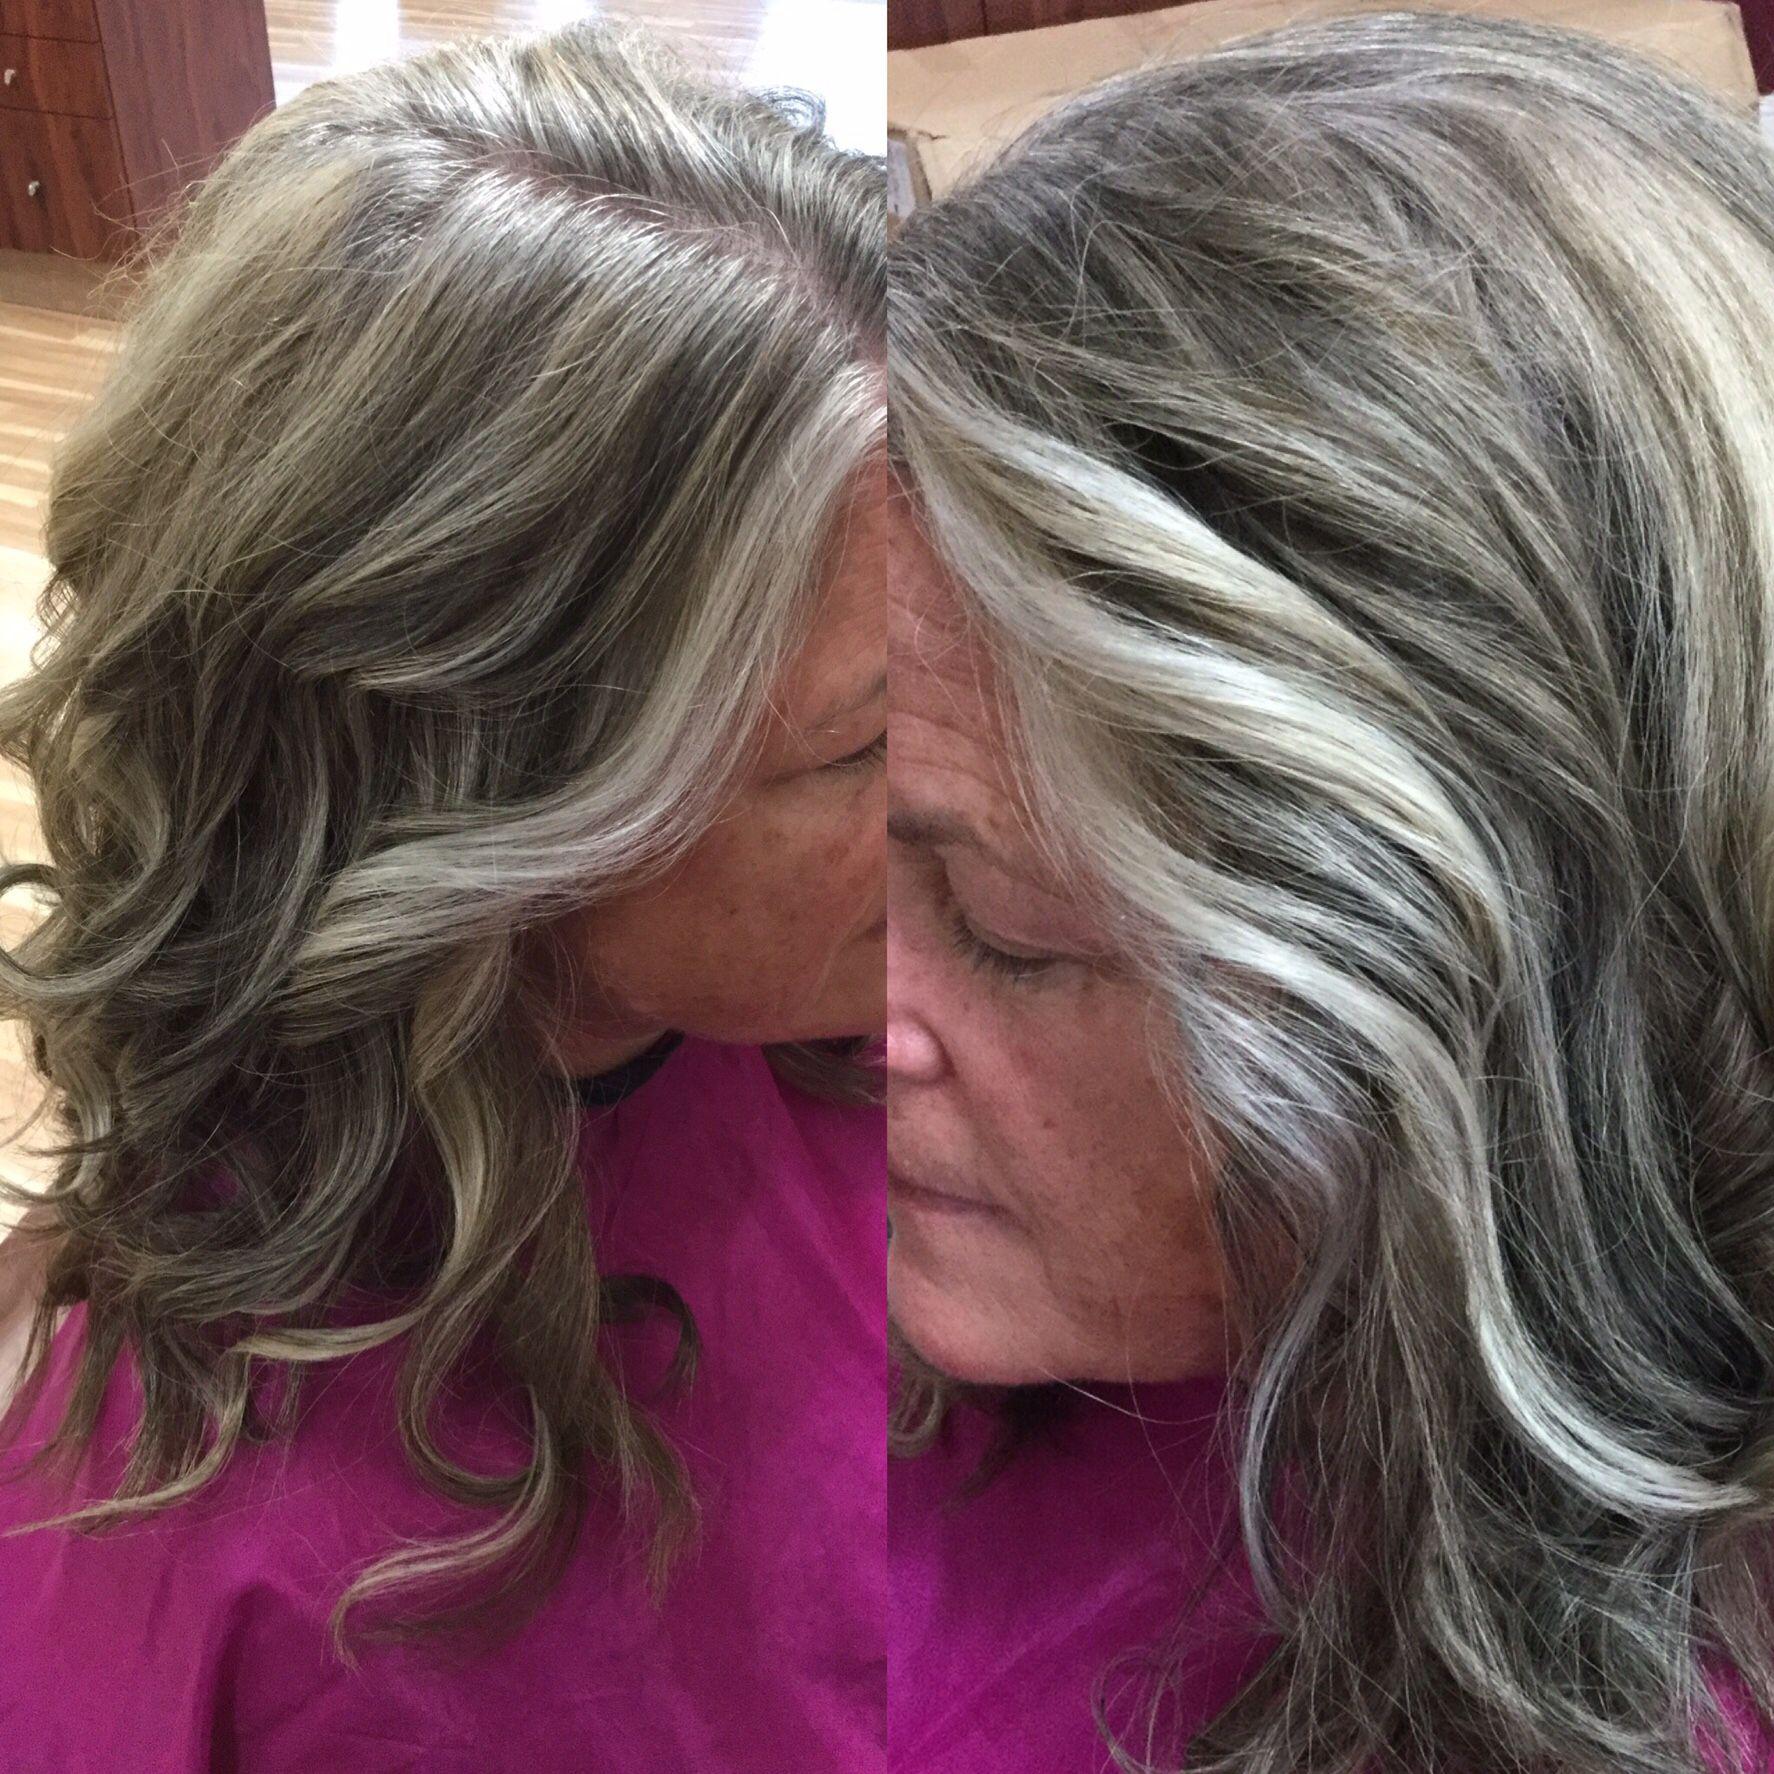 Blending Grey On My Client Kristen Grey Blending Grow Out Studio 1 Salon Blending Gray Hair Hair Highlights Gray Hair Growing Out